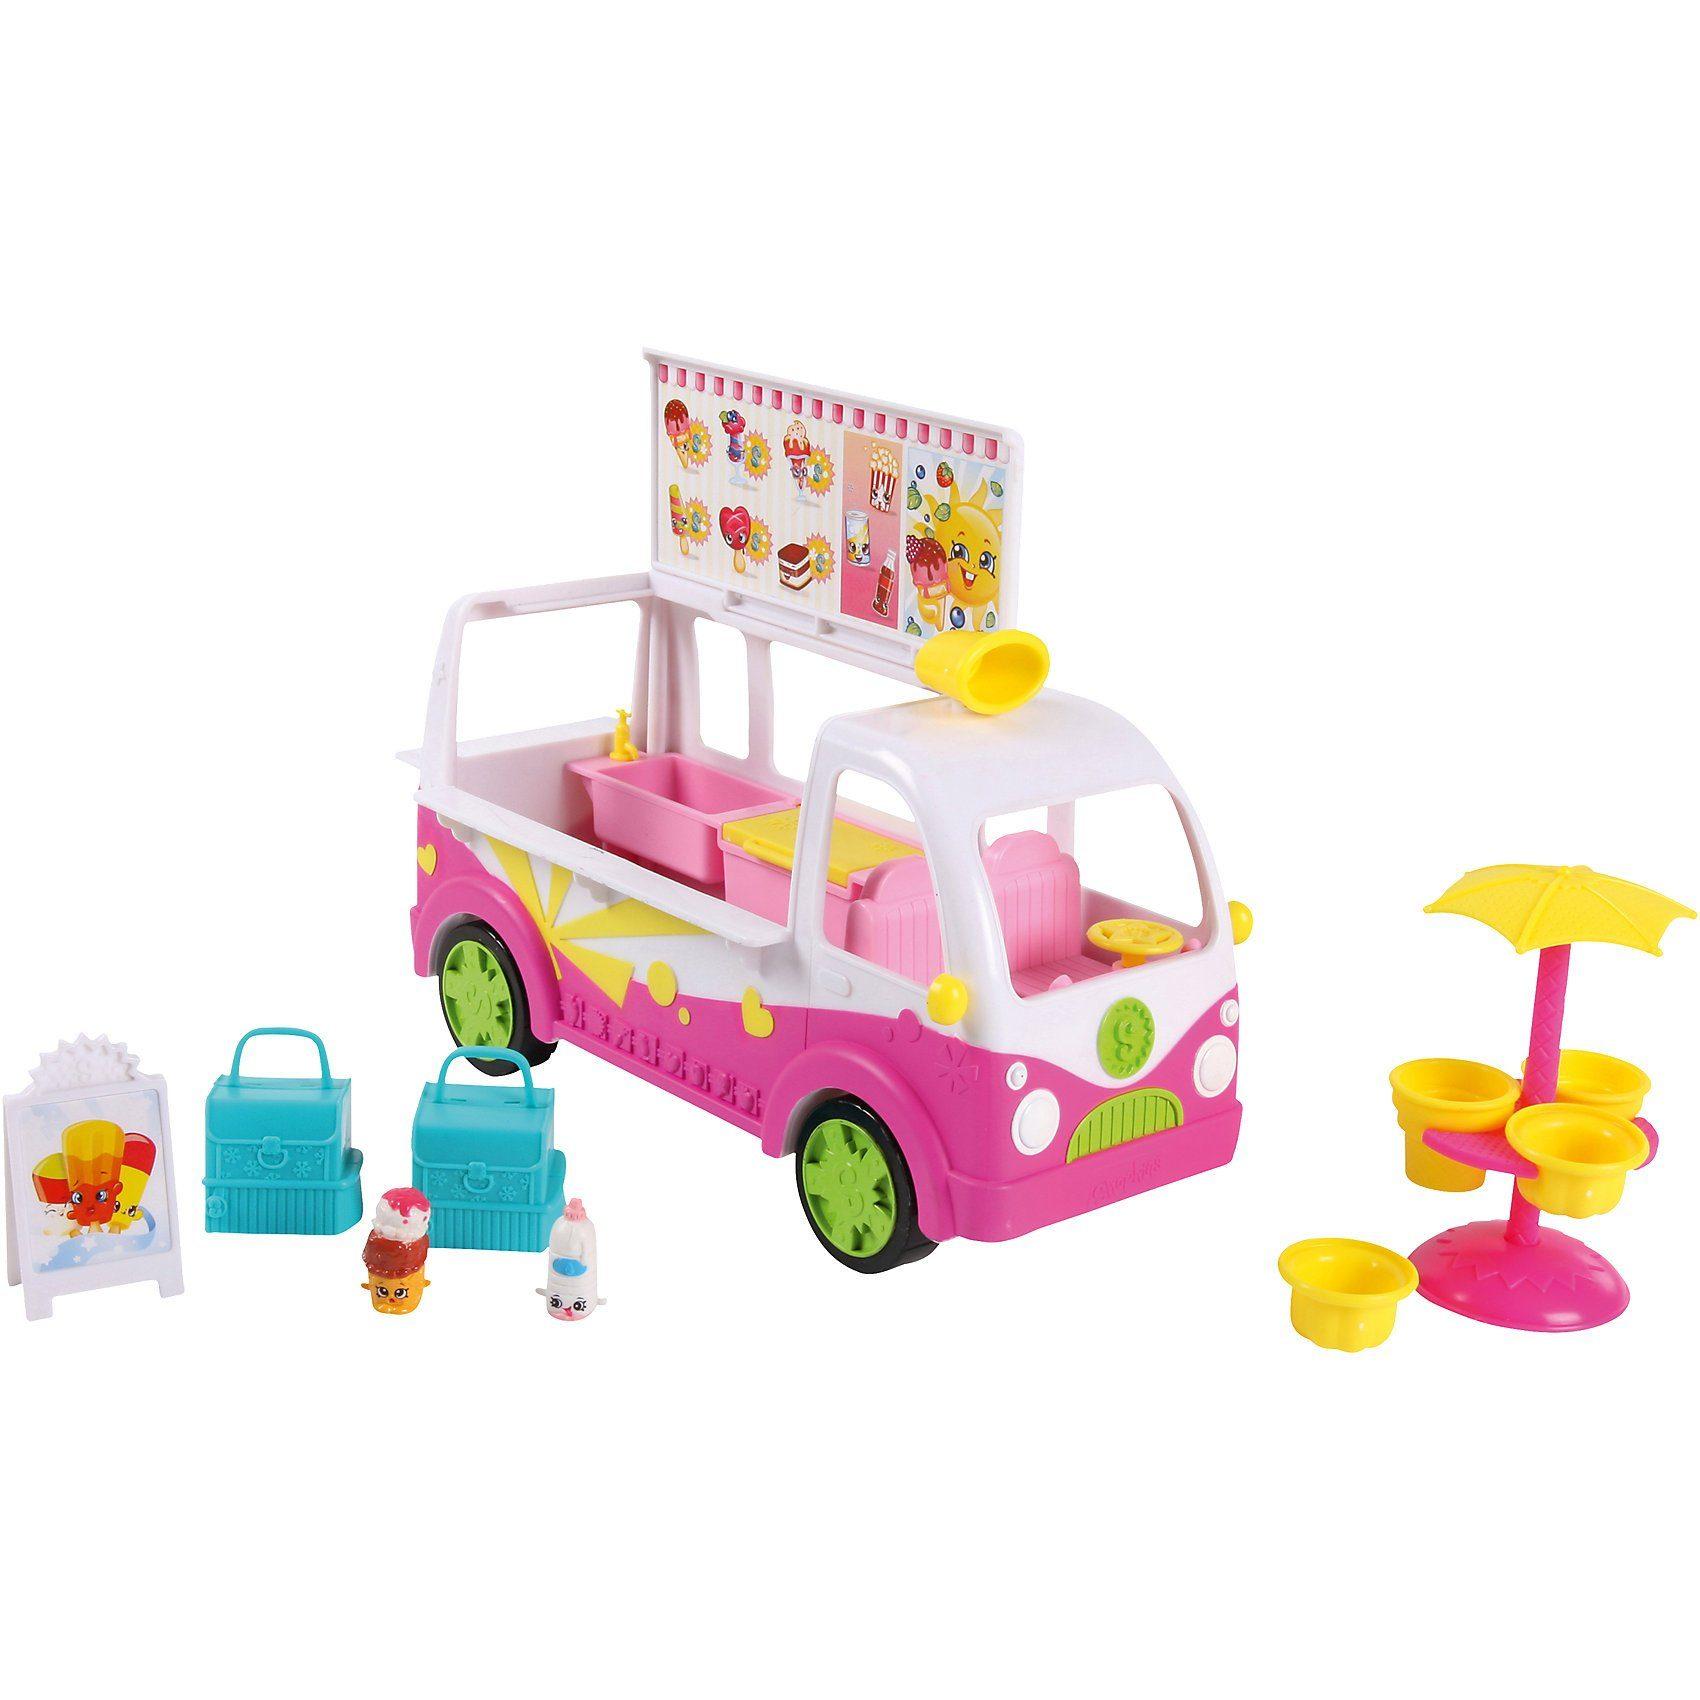 Giochi Preziosi Shopkins #3 Eiswagen